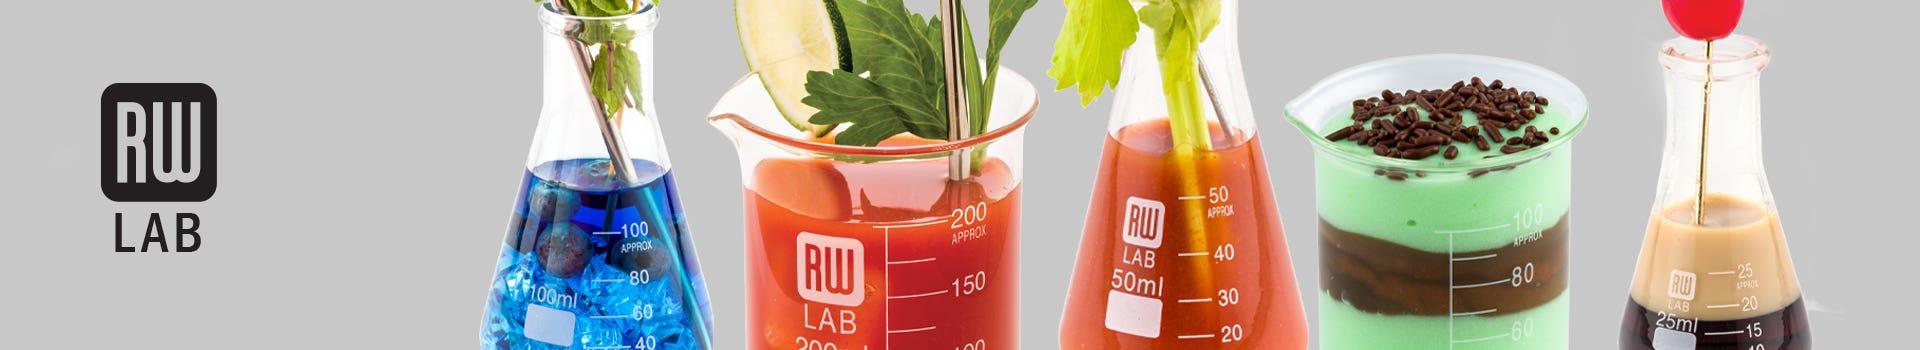 RW Lab